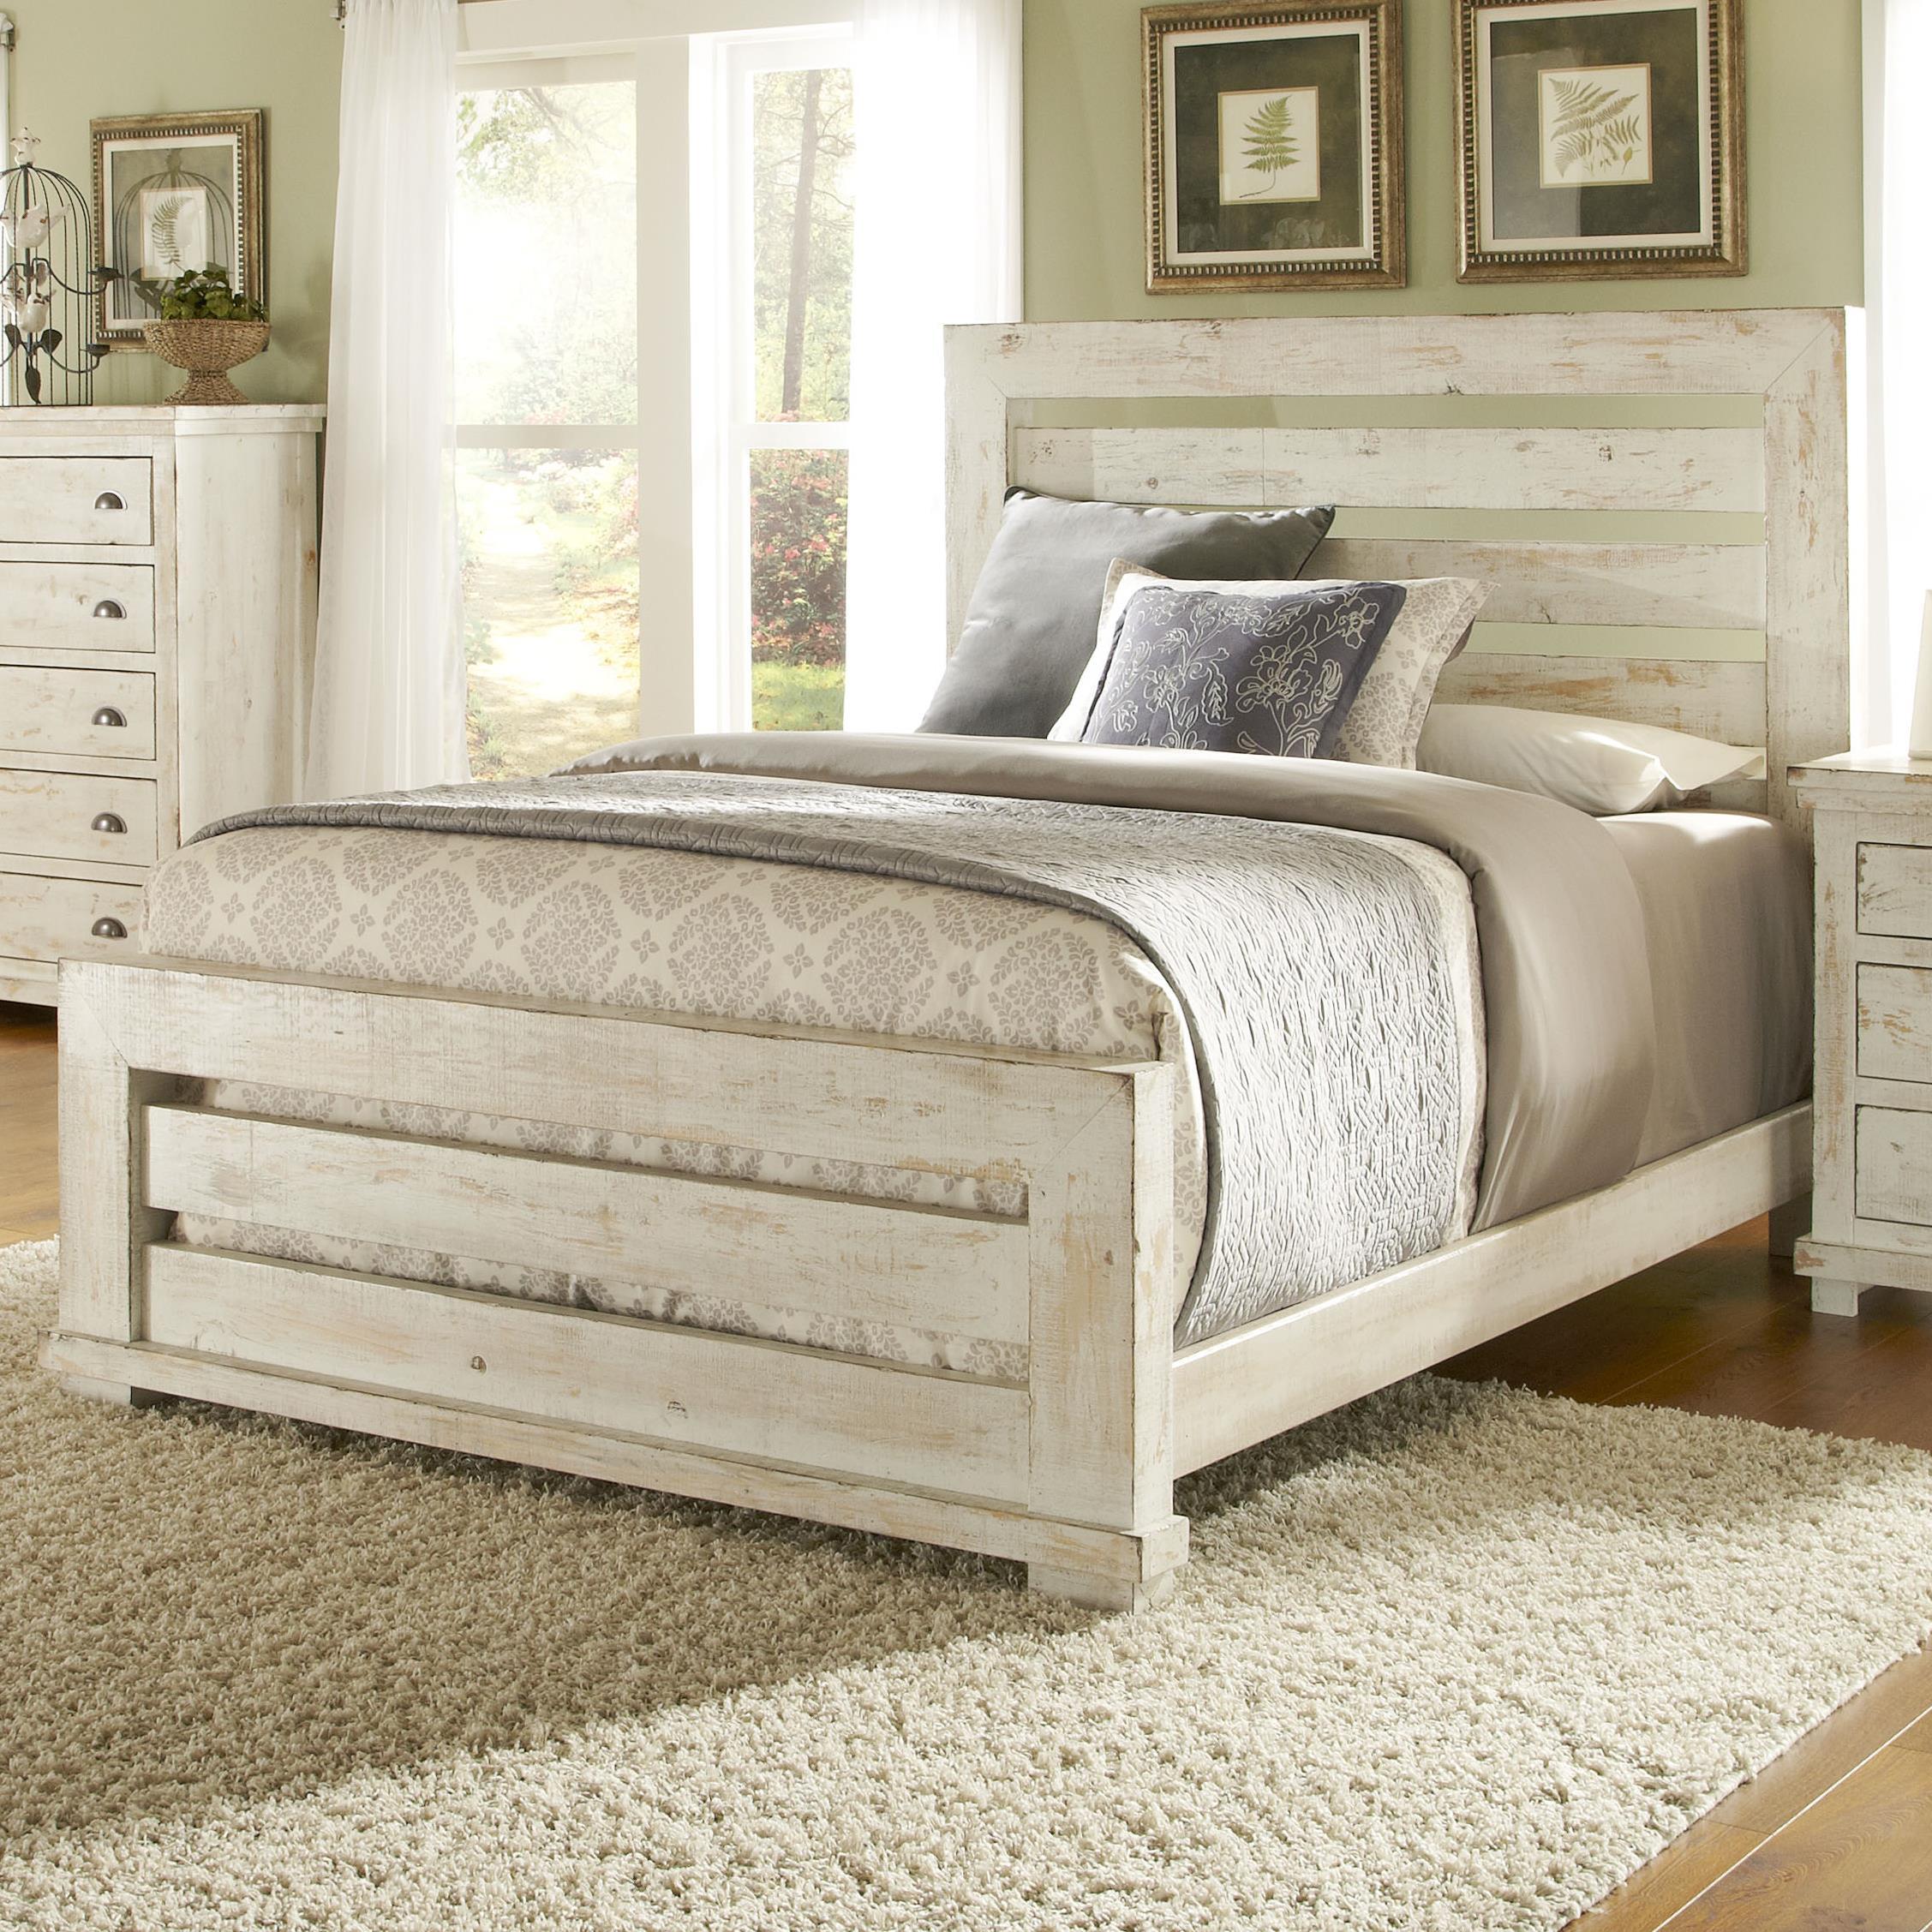 Progressive Furniture Willow California King Slat Bed - Item Number: P610-80+81+98